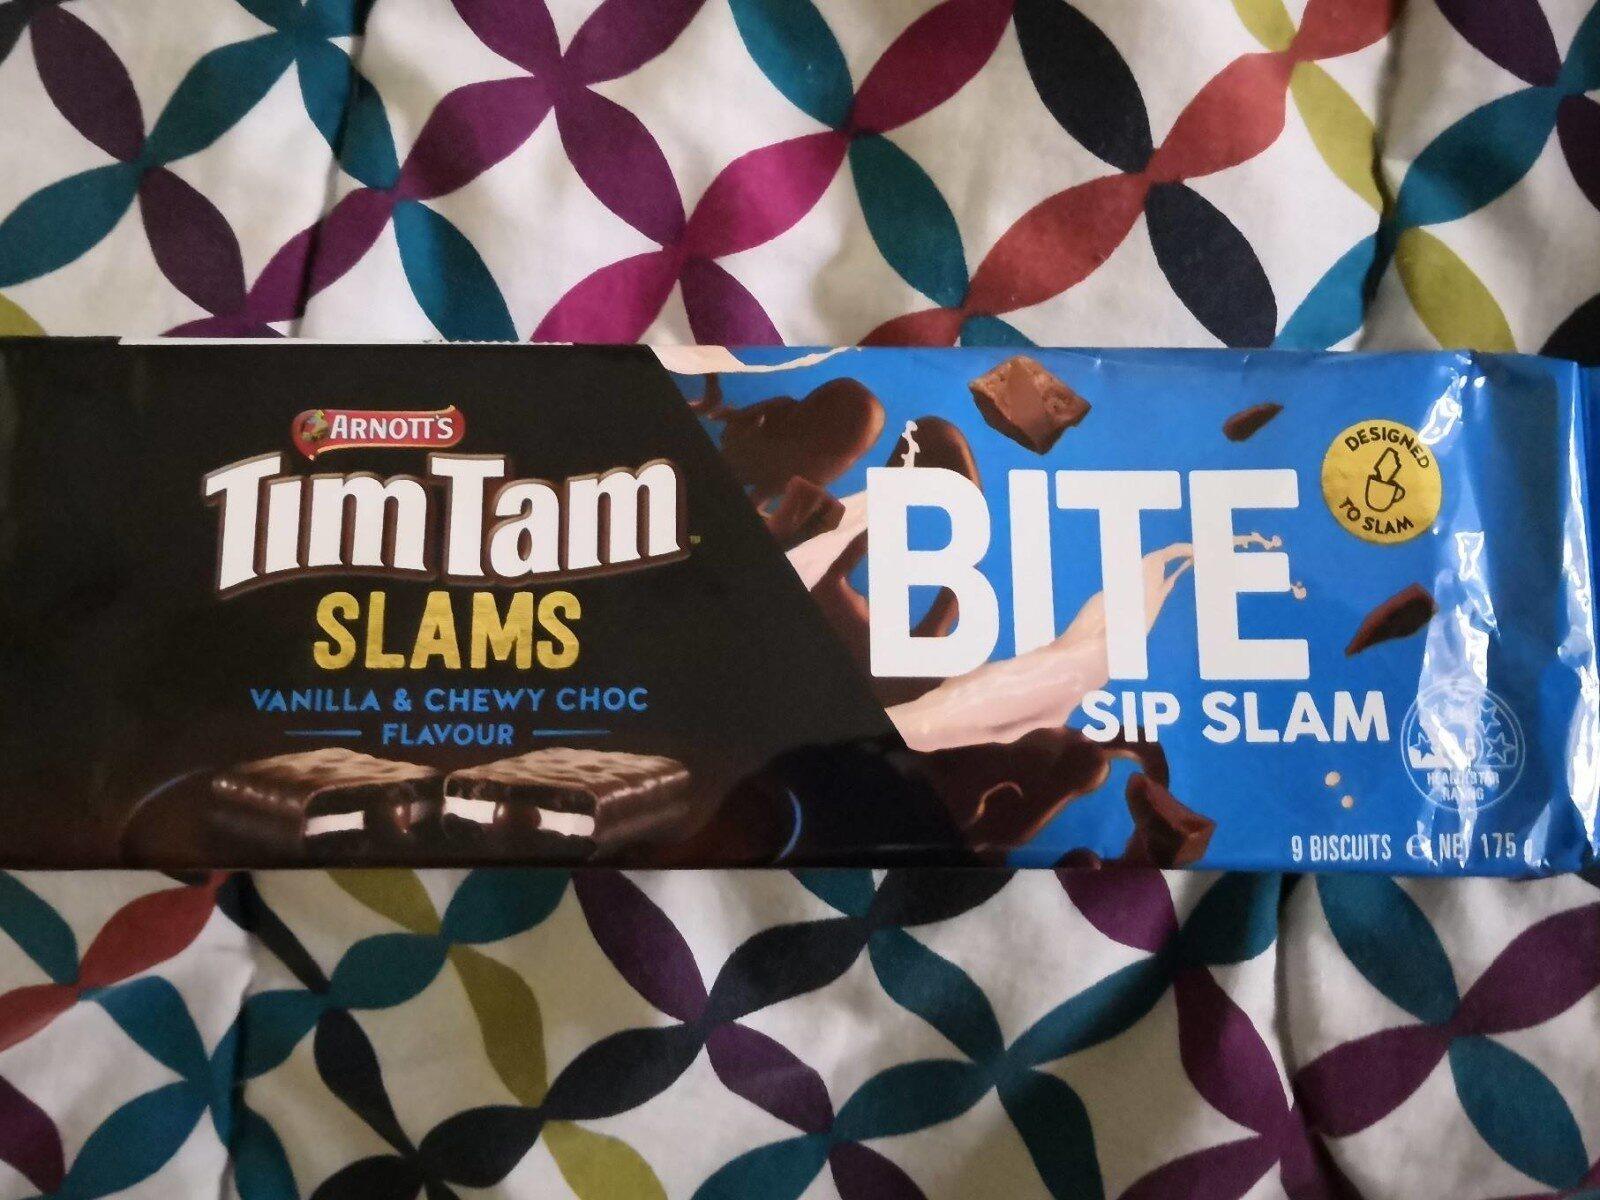 Tim tam - Product